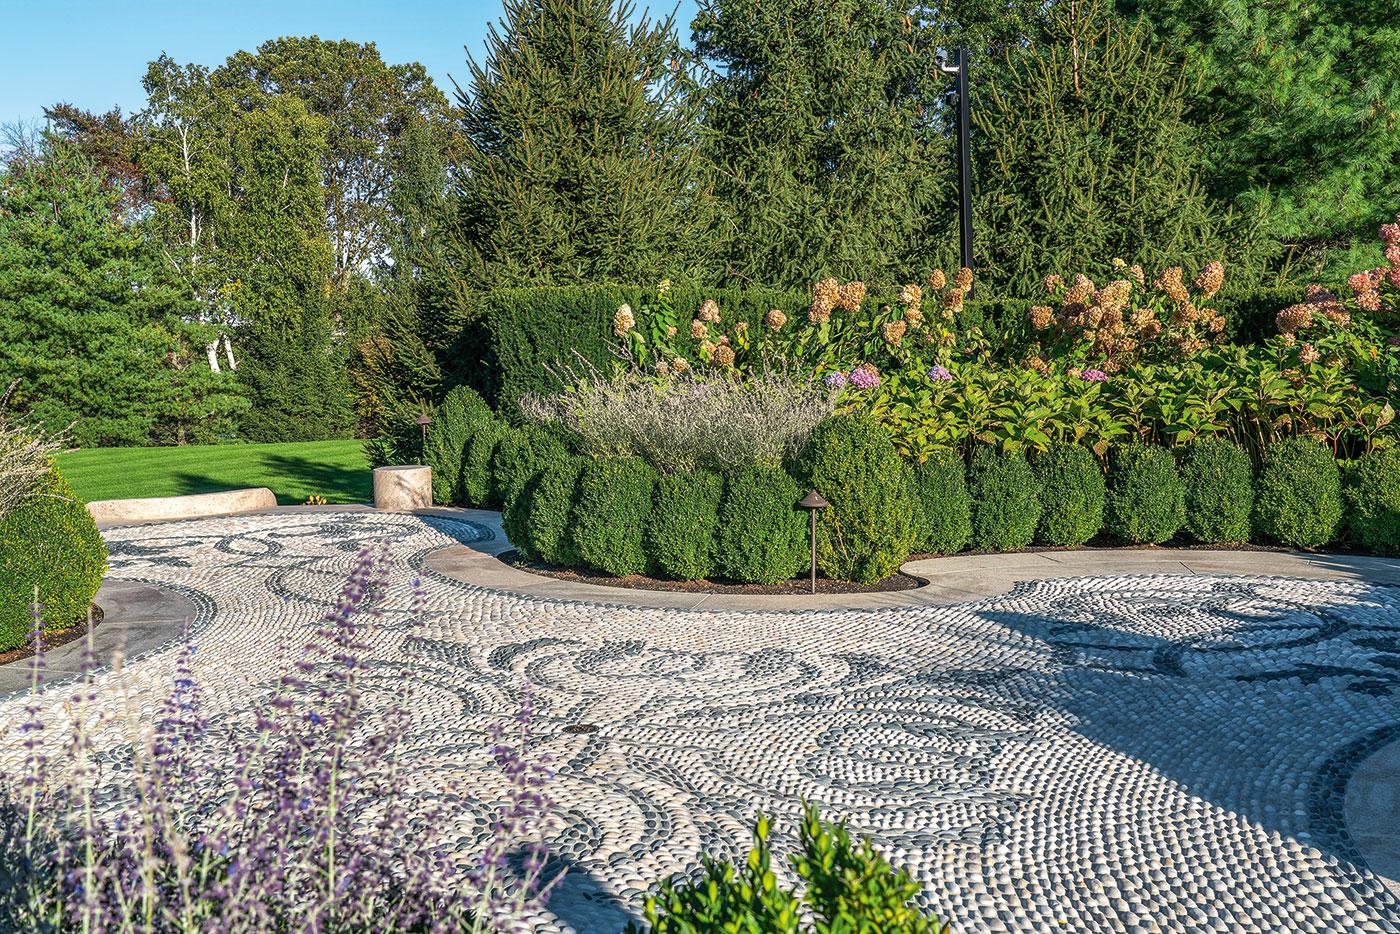 Pebble terrace on Ernie Boch Jr.'s garden pavilion